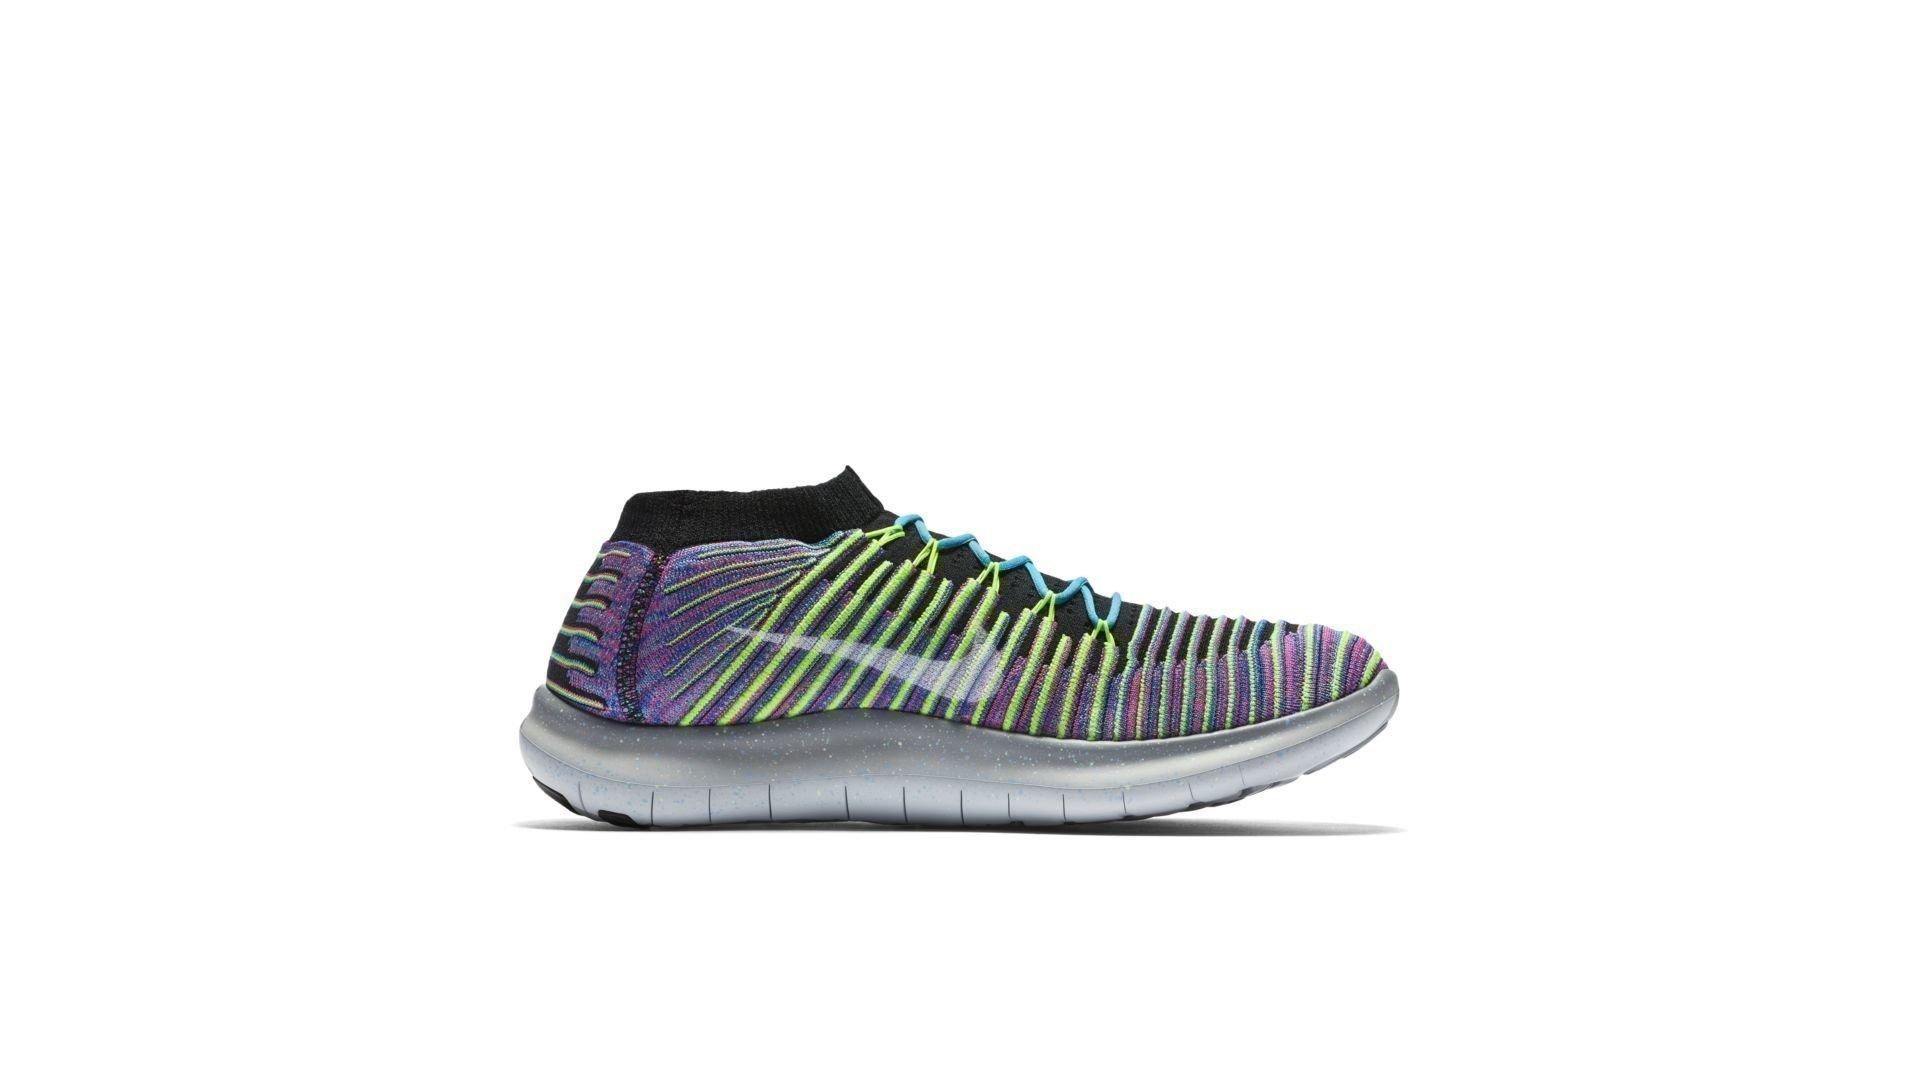 Nike Free RN Motion Flyknit Multi-Color (834584-006)